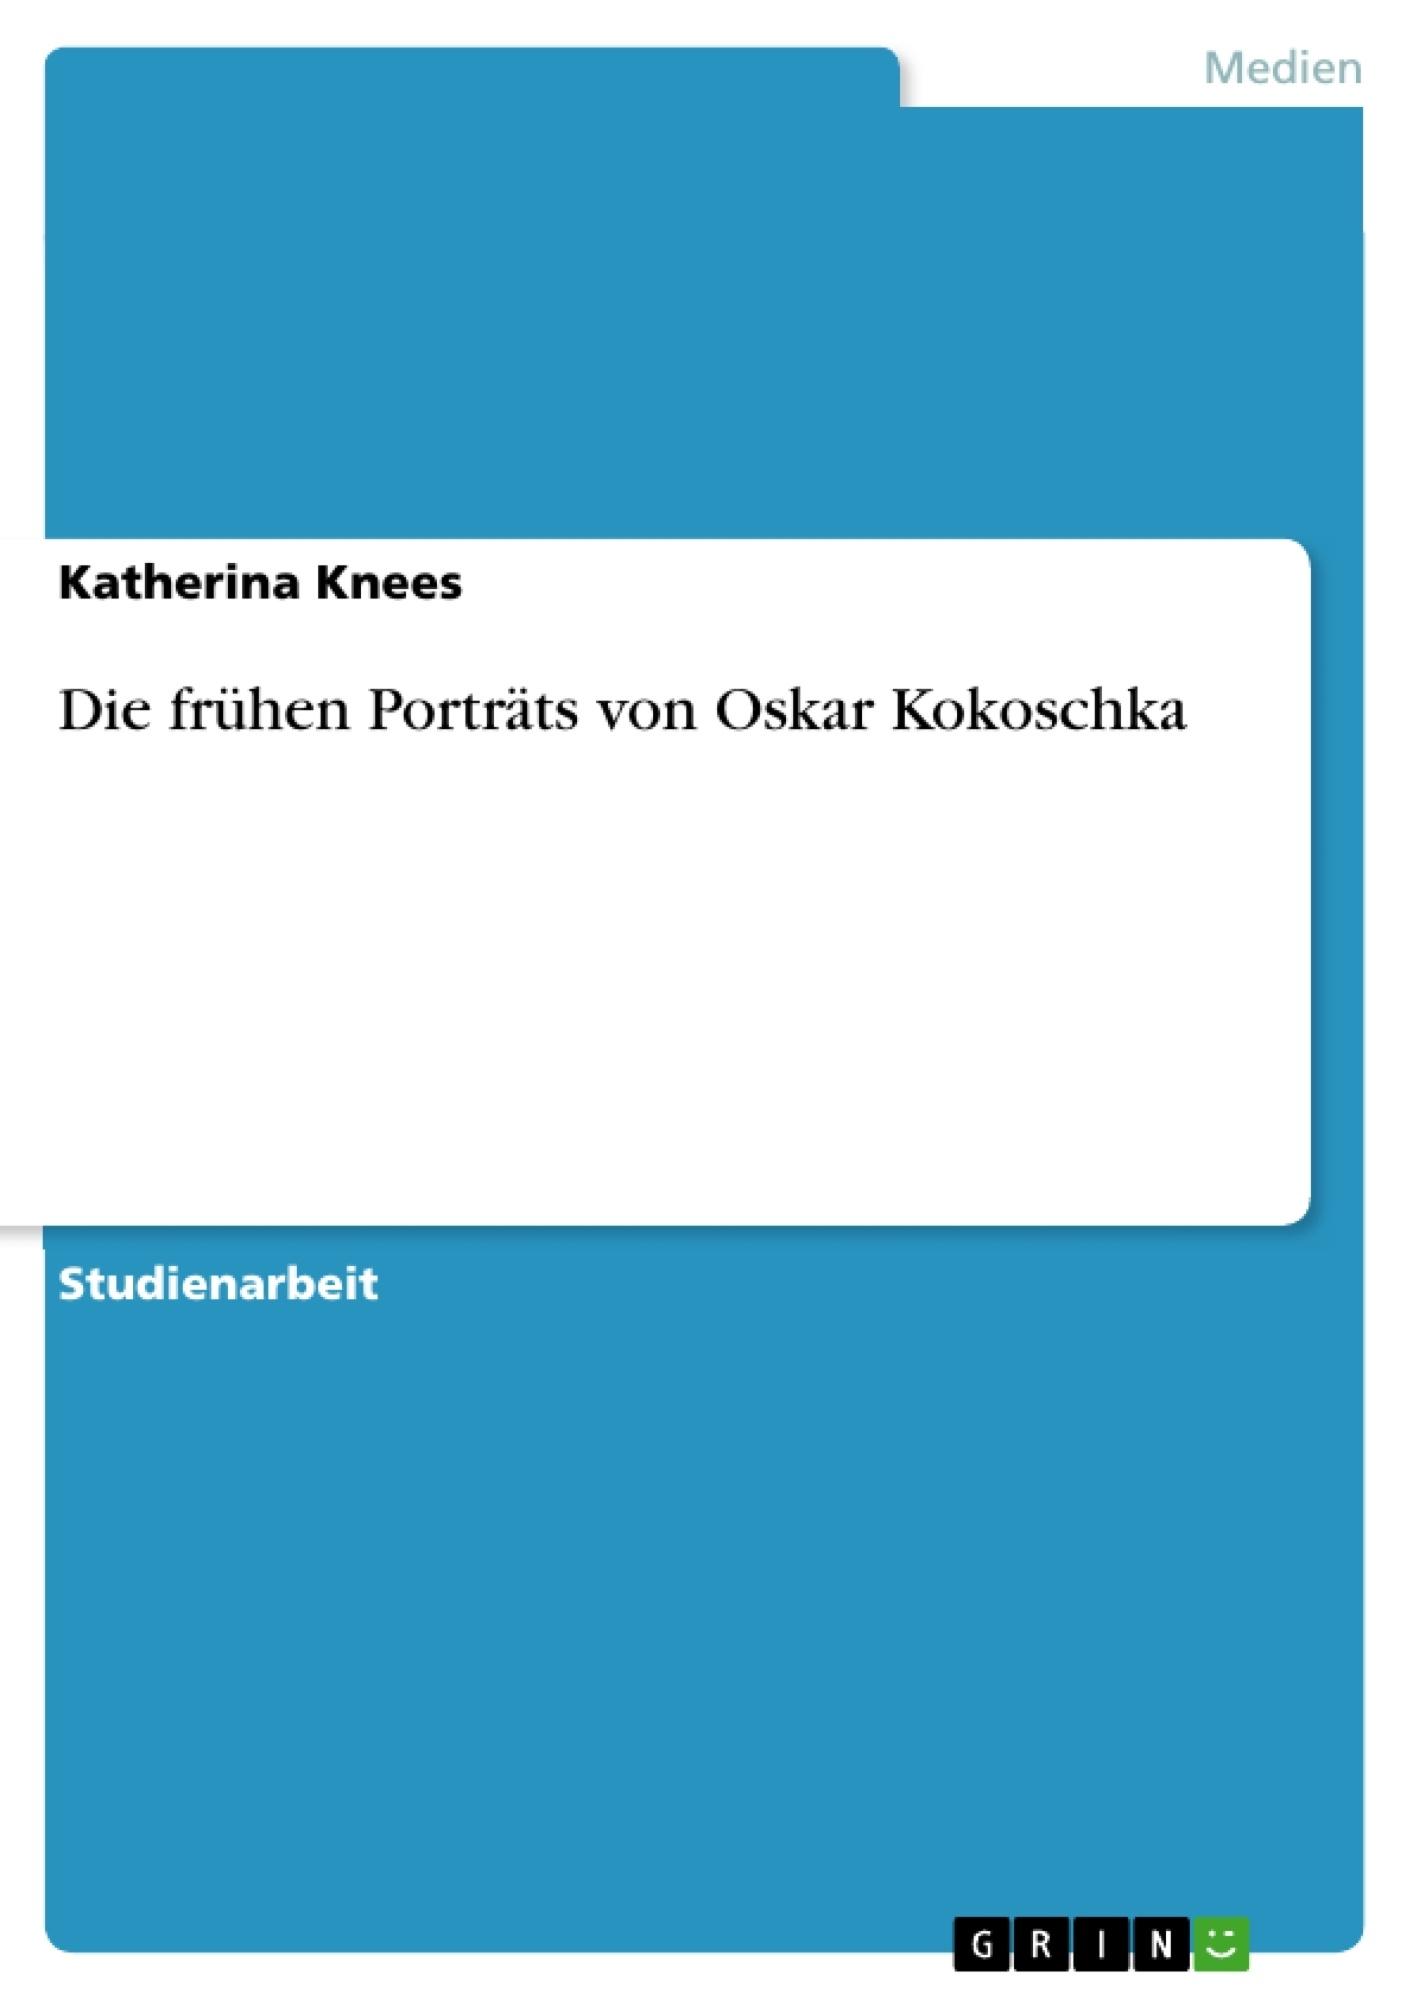 Titel: Die frühen Porträts von Oskar Kokoschka